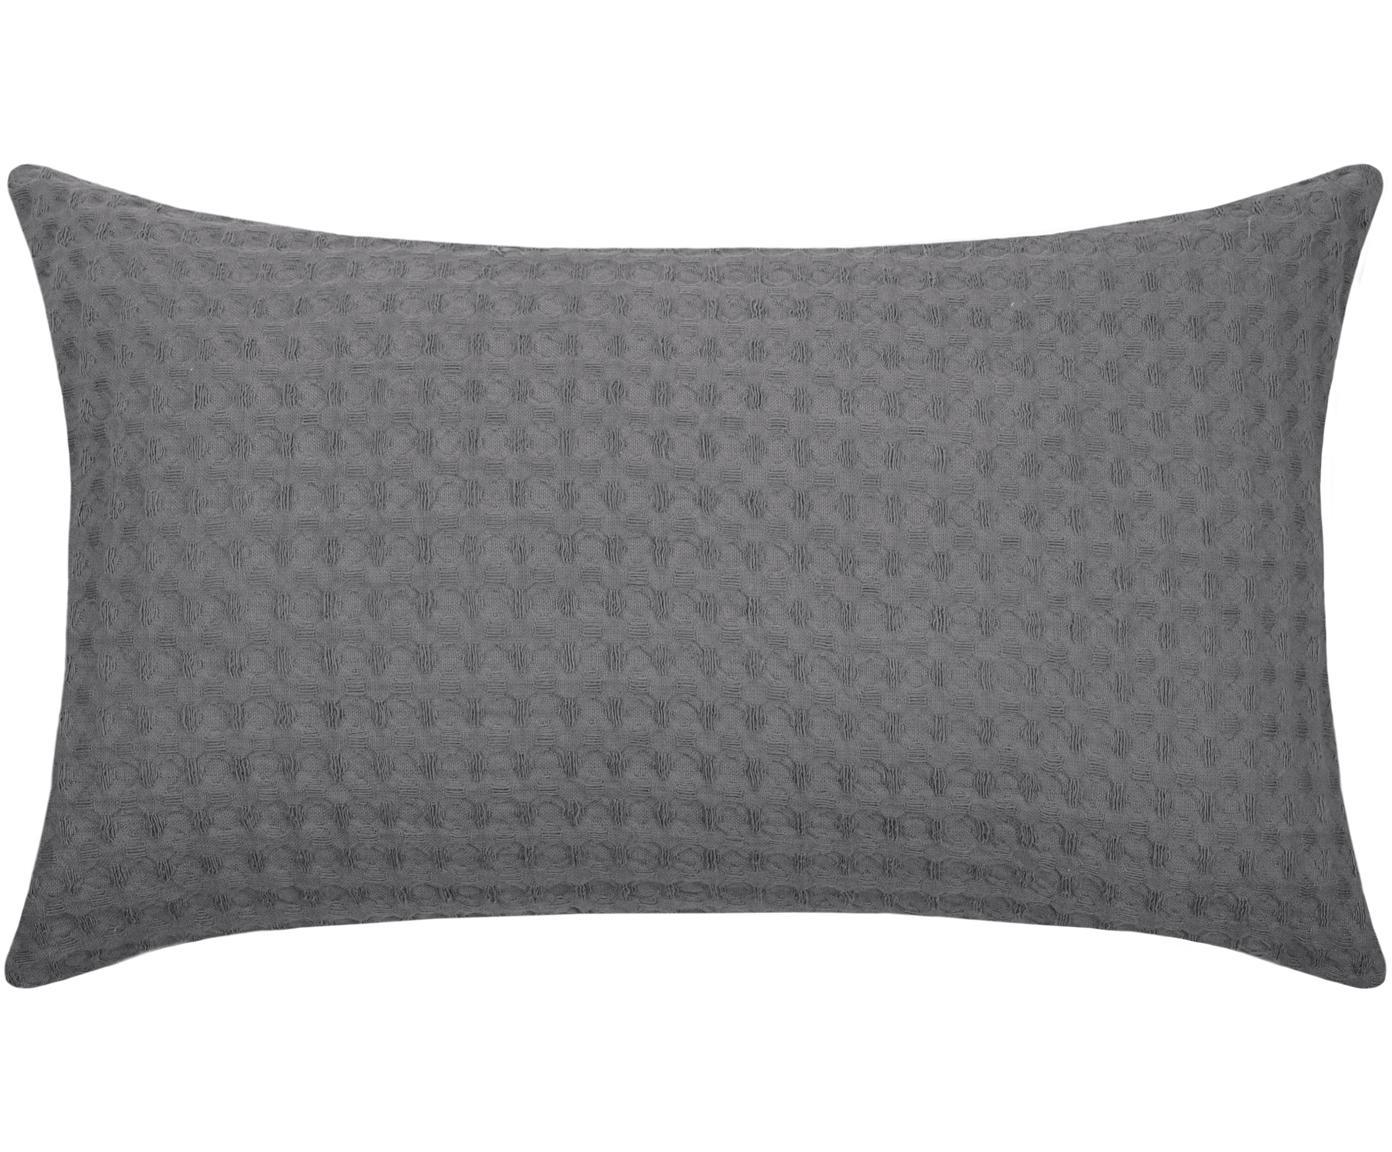 Cuscino con imbottitura Gopher, Rivestimento: cotone, Grigio, Larg. 30 x Lung. 50 cm